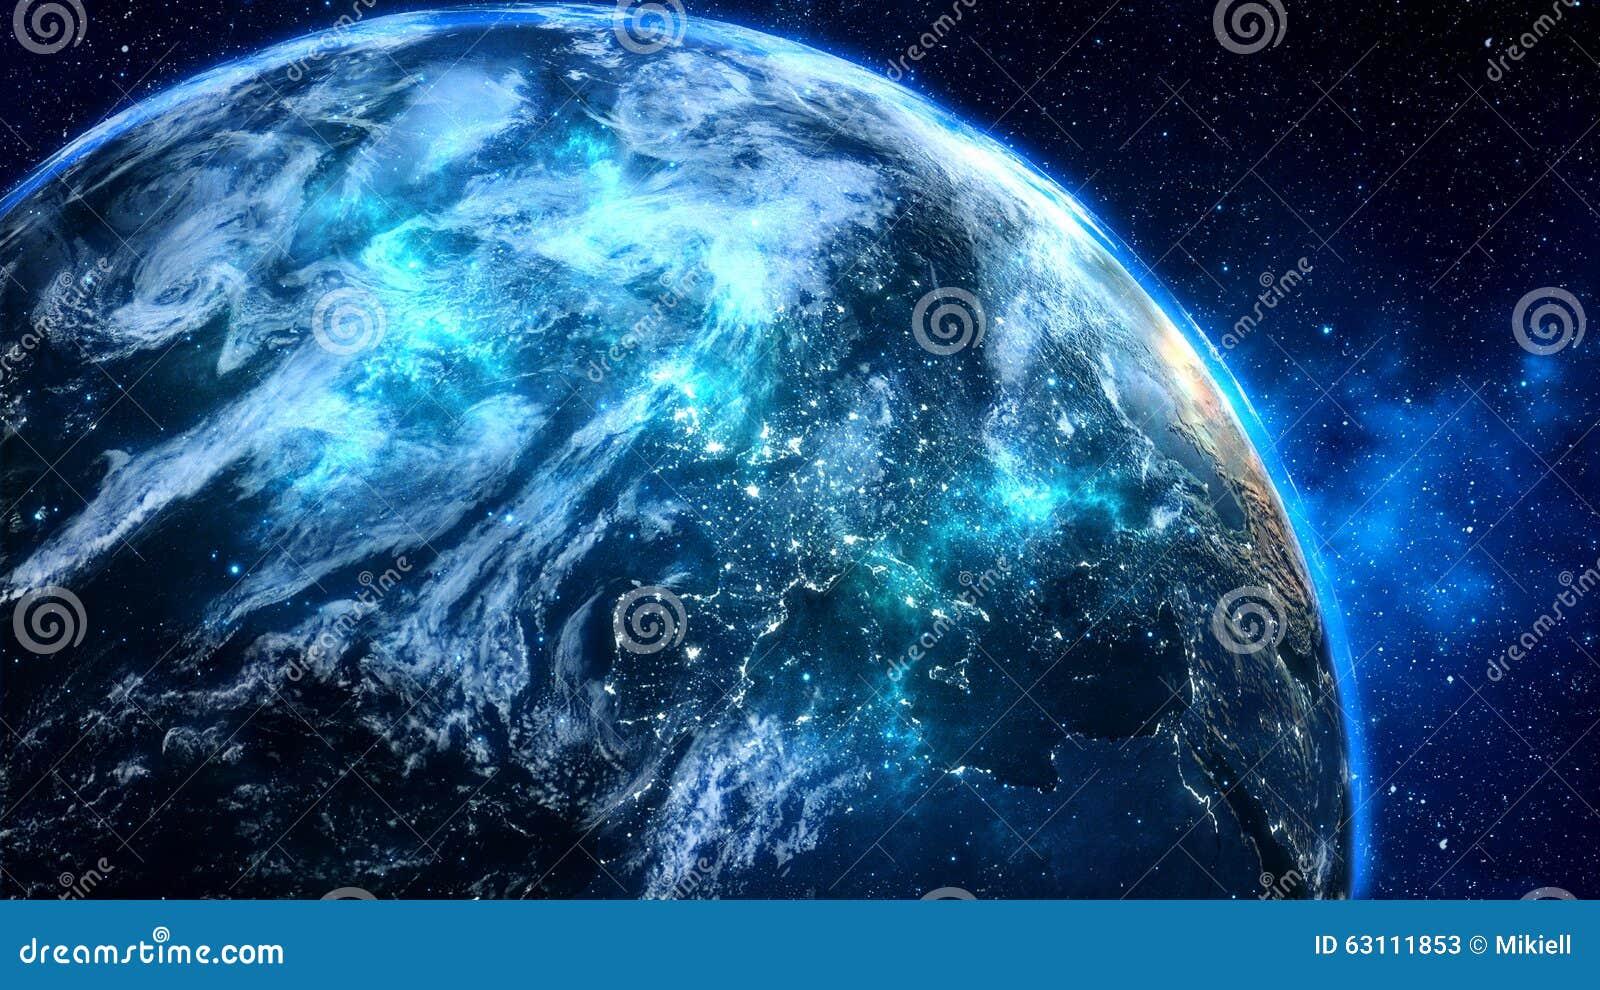 galaxy planet earth - photo #30